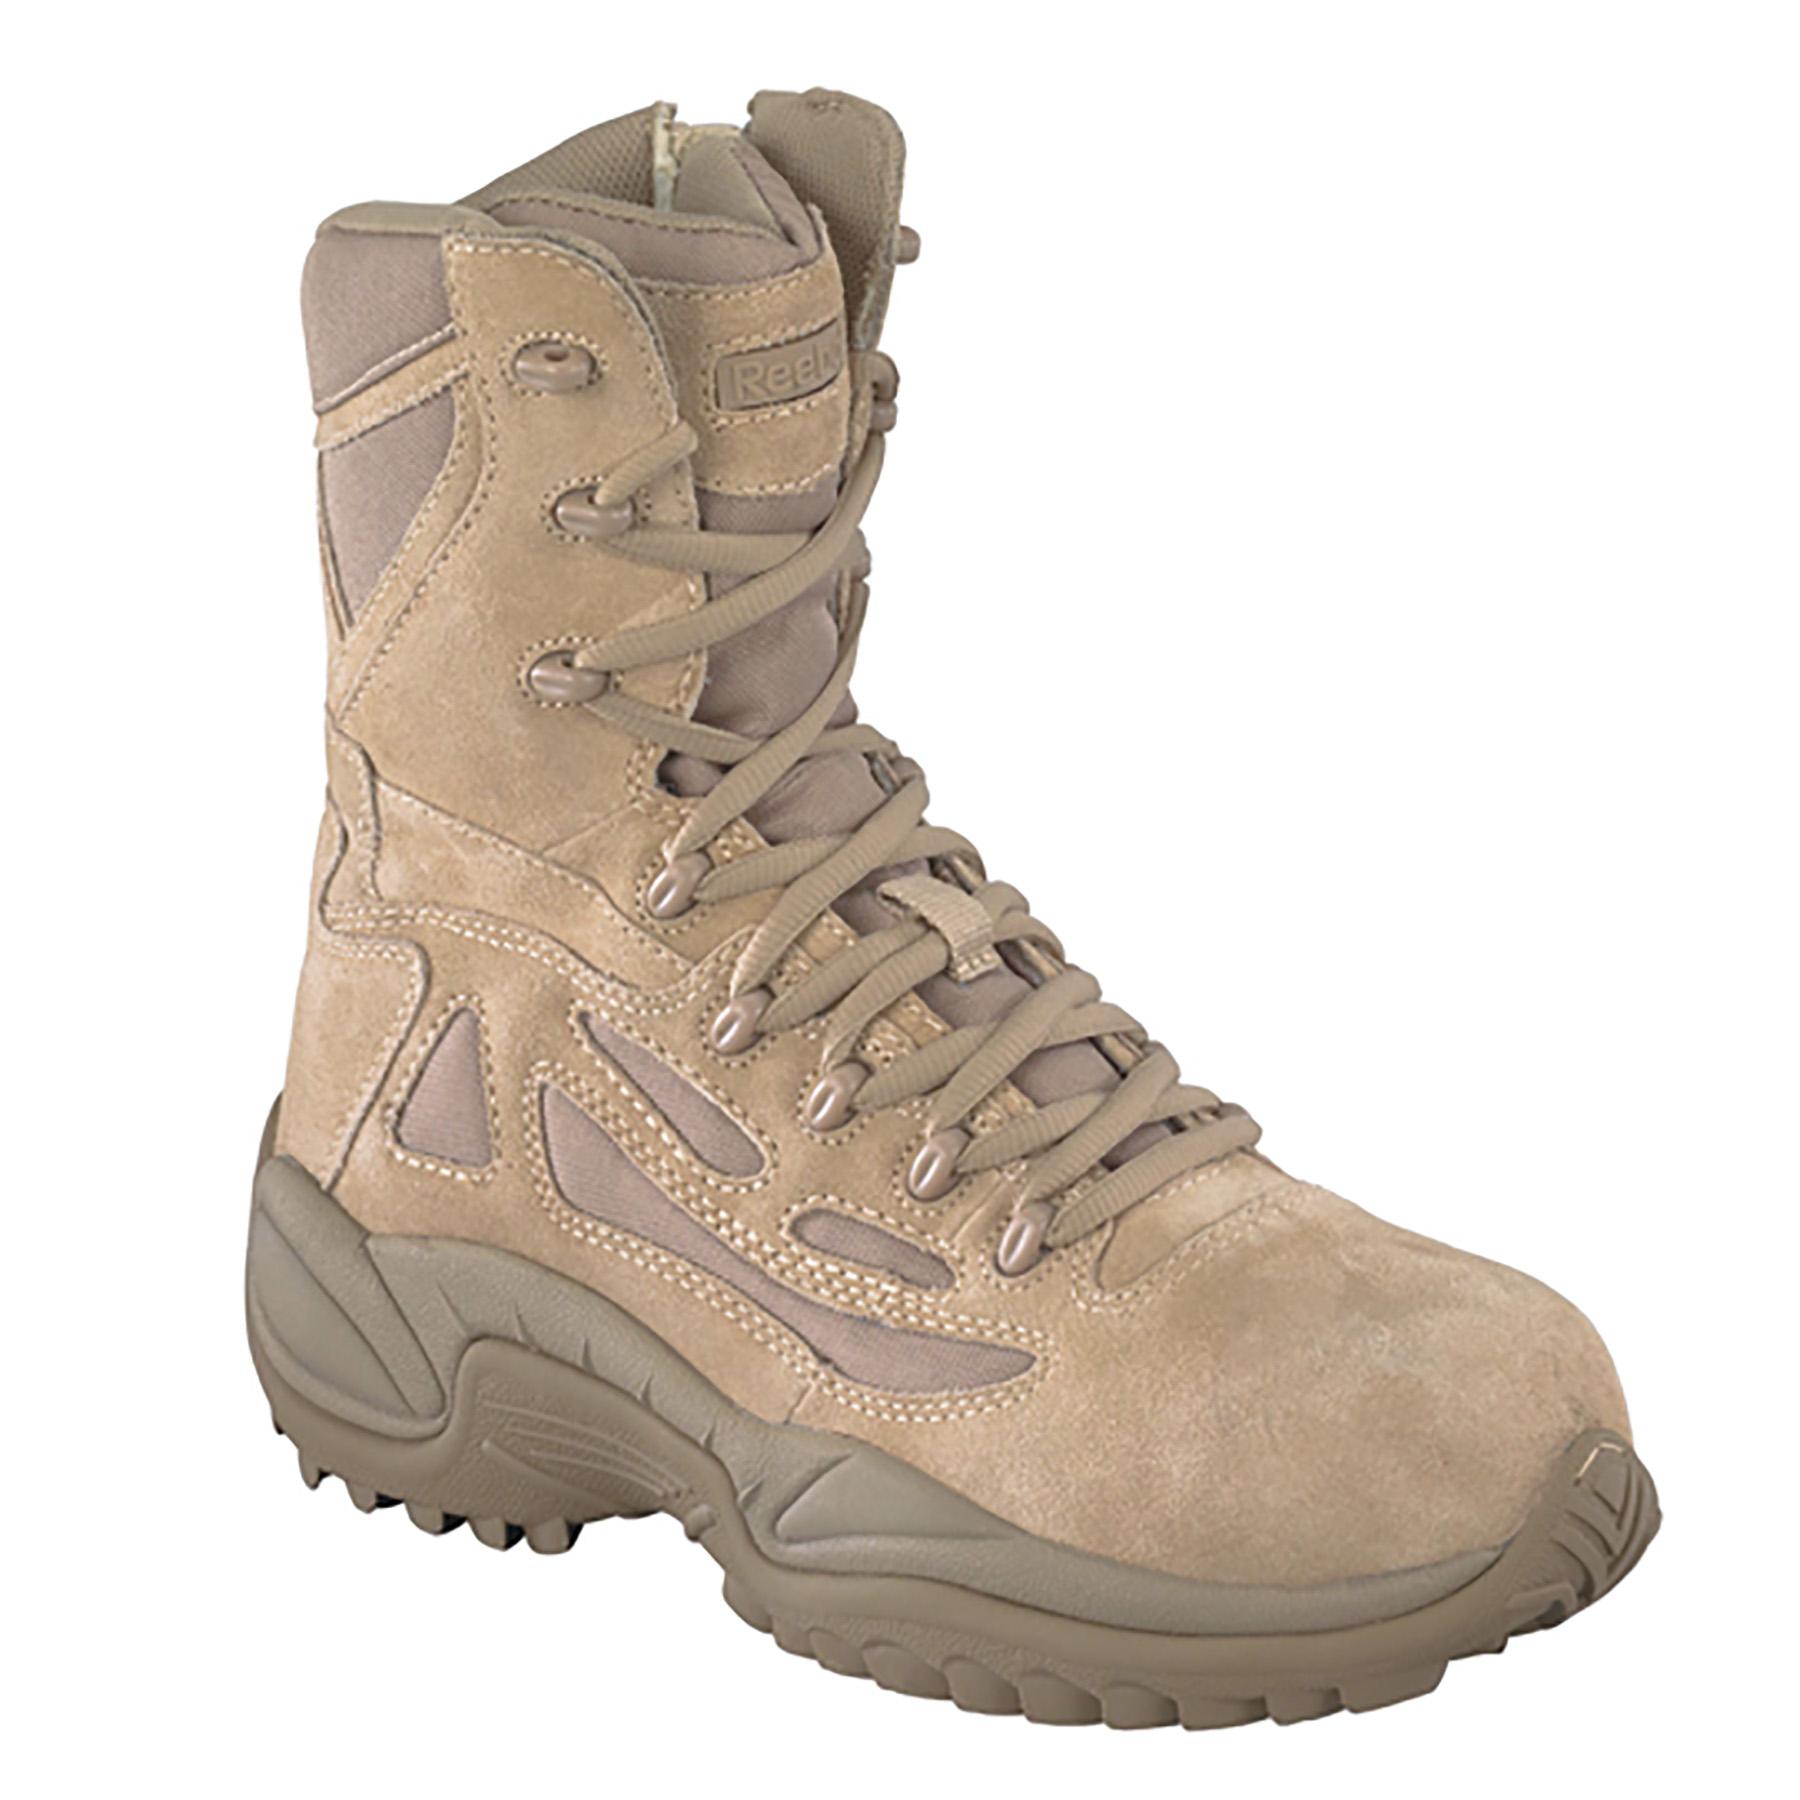 am besten verkaufen bestbewertetes Original billigsten Verkauf Reebok Womens Desert Tan Soft Toe Boots.